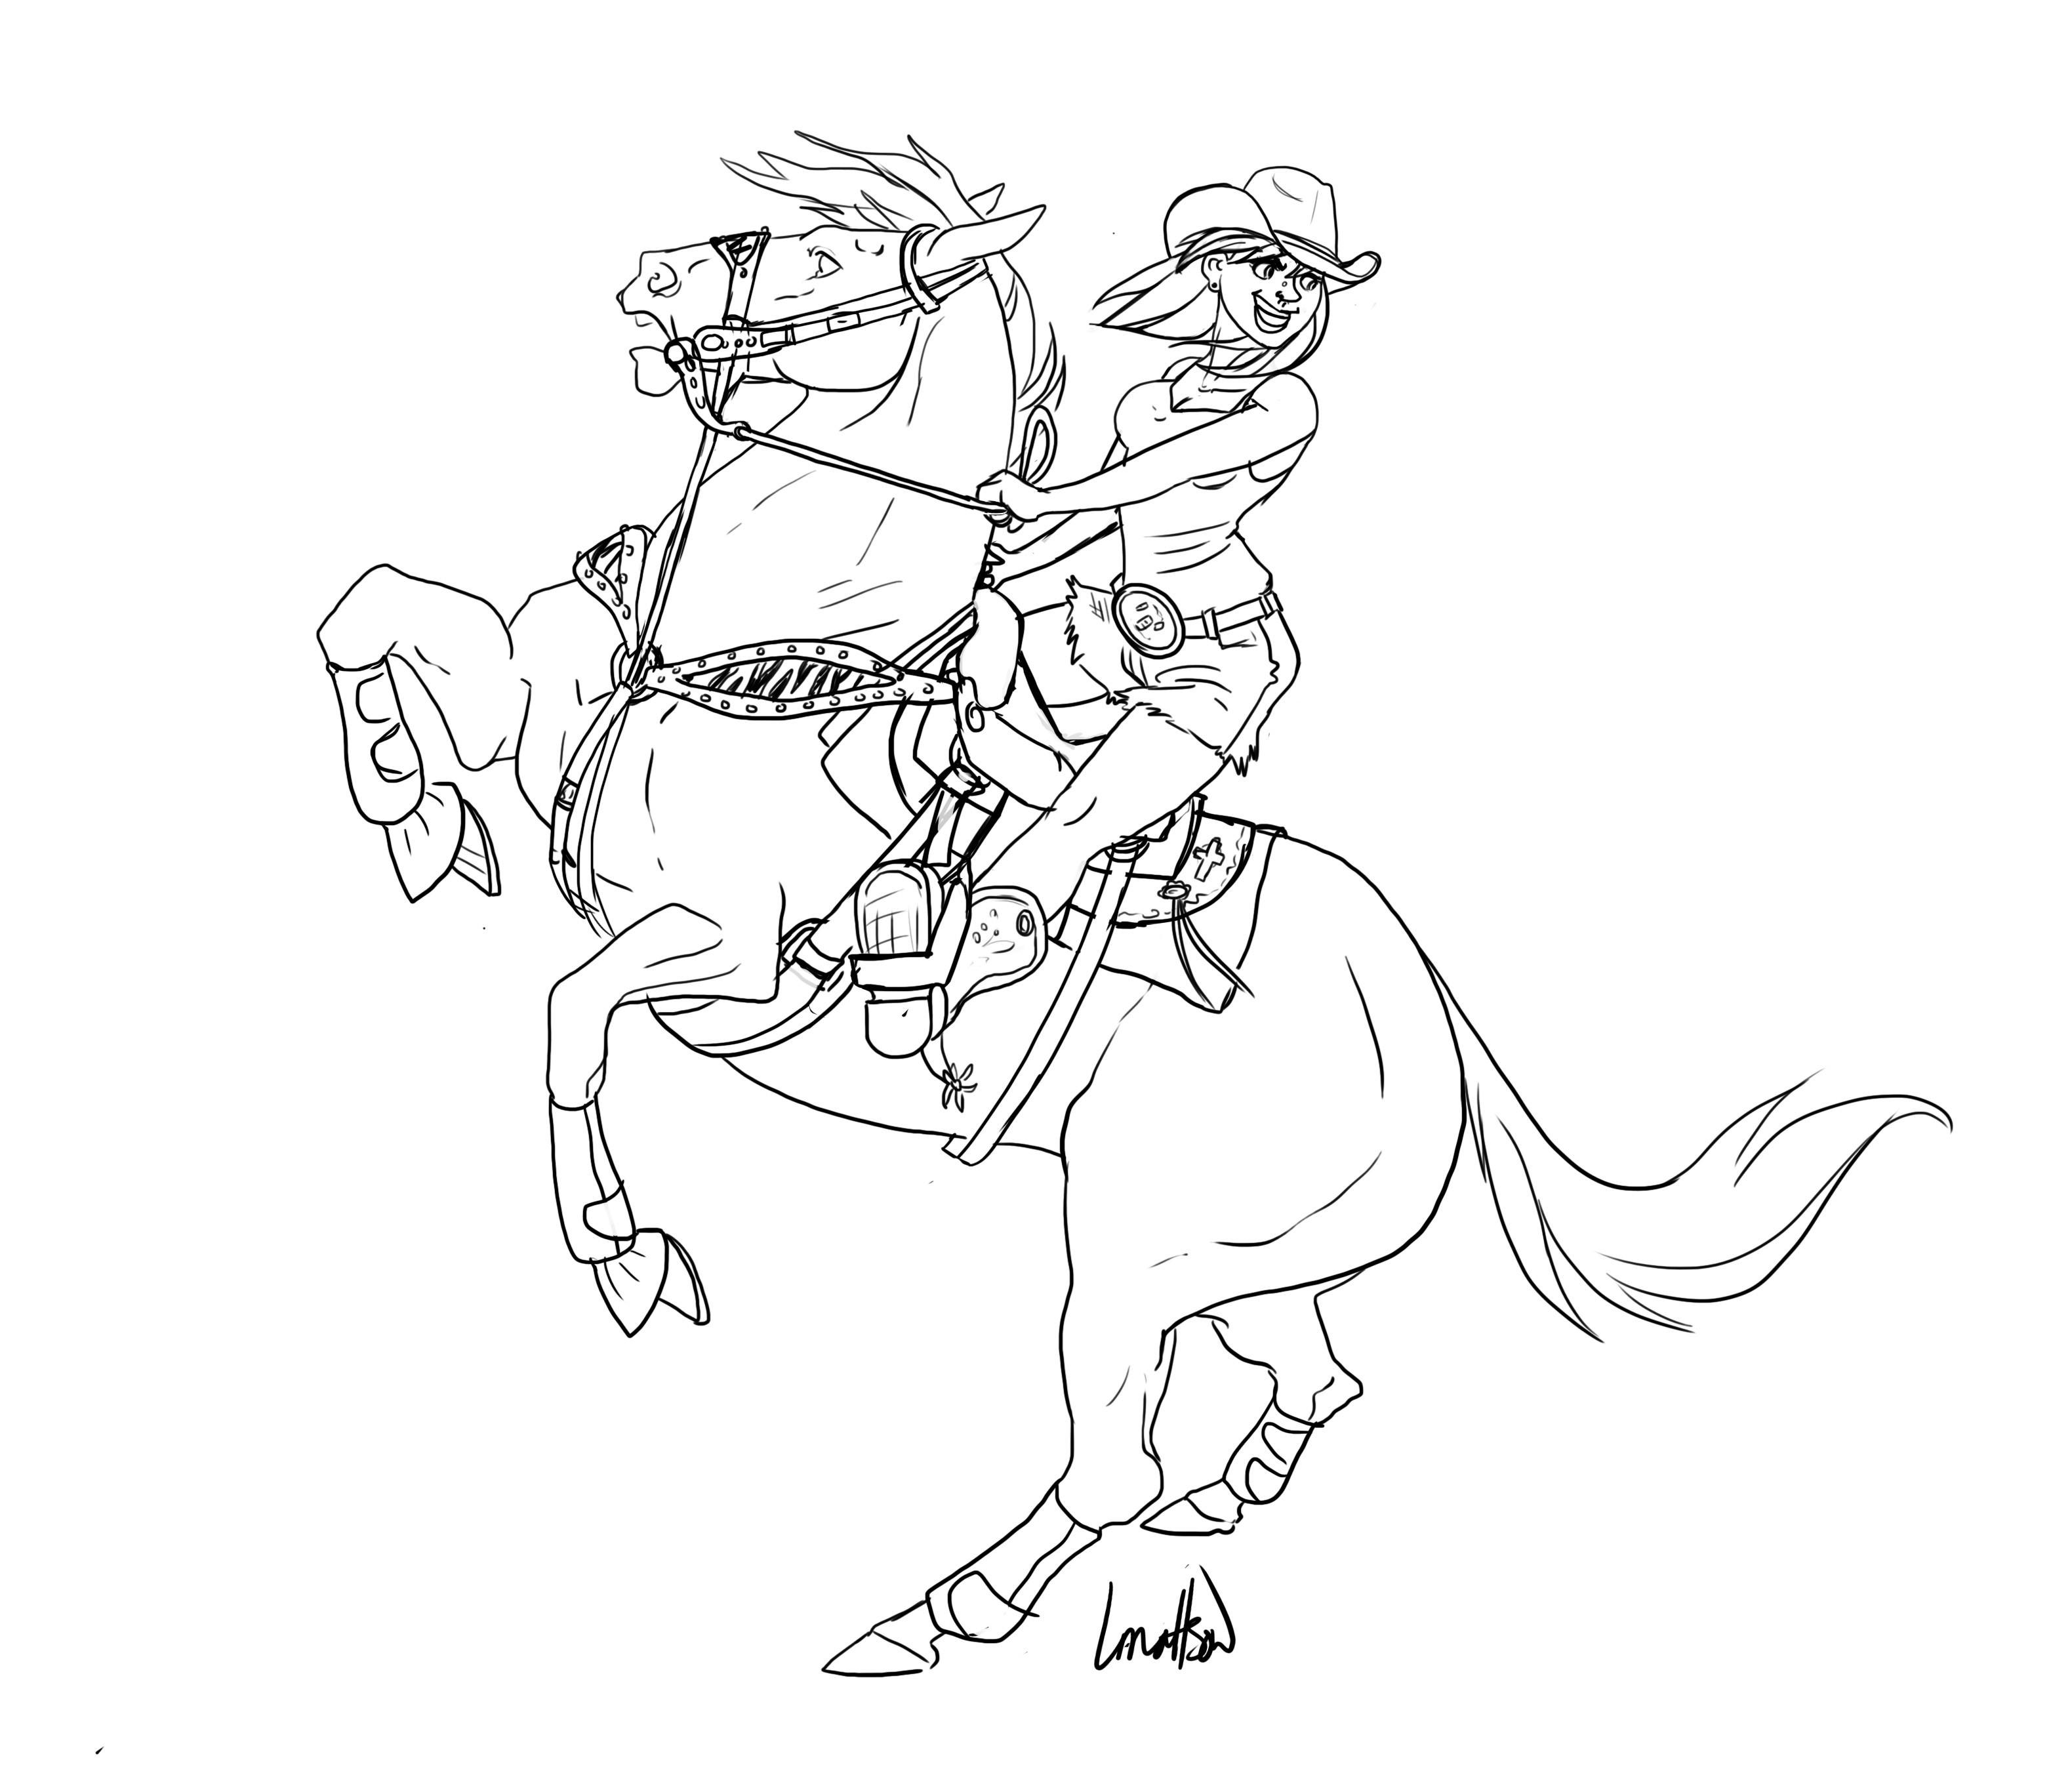 Line Art Design Trend : Beautiful horse drawings art ideas design trends